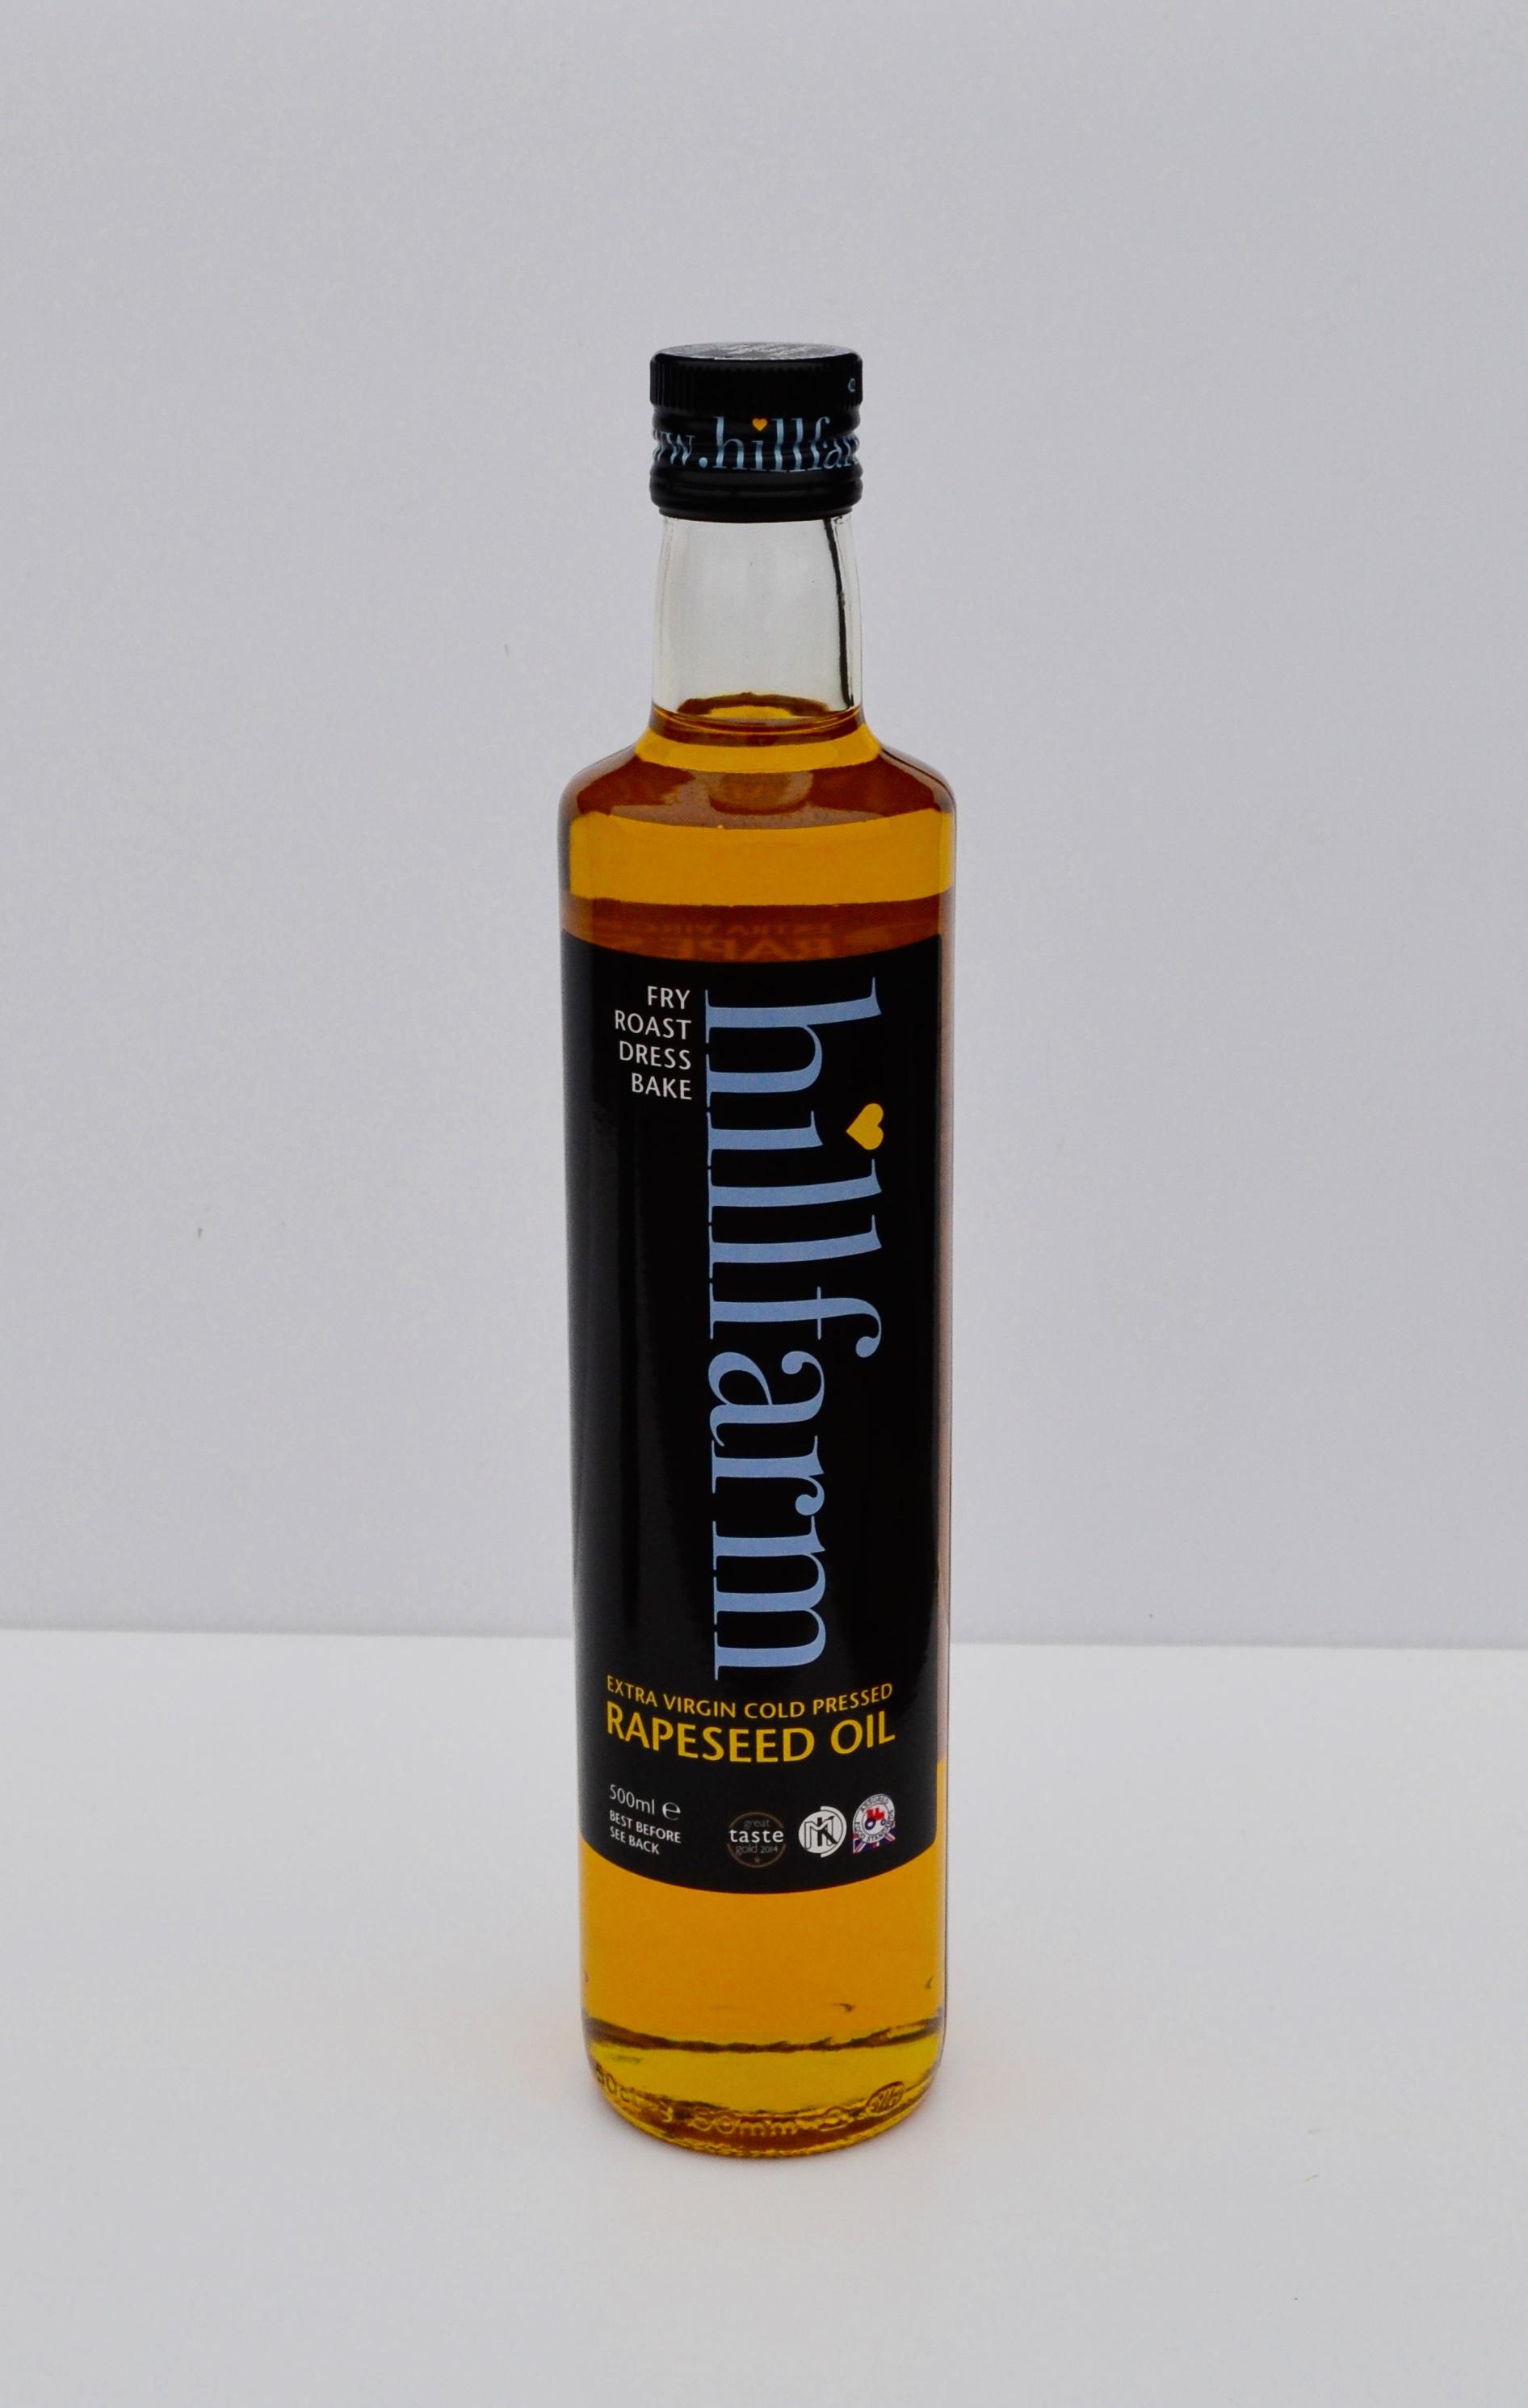 hillfarm clear glass bottle